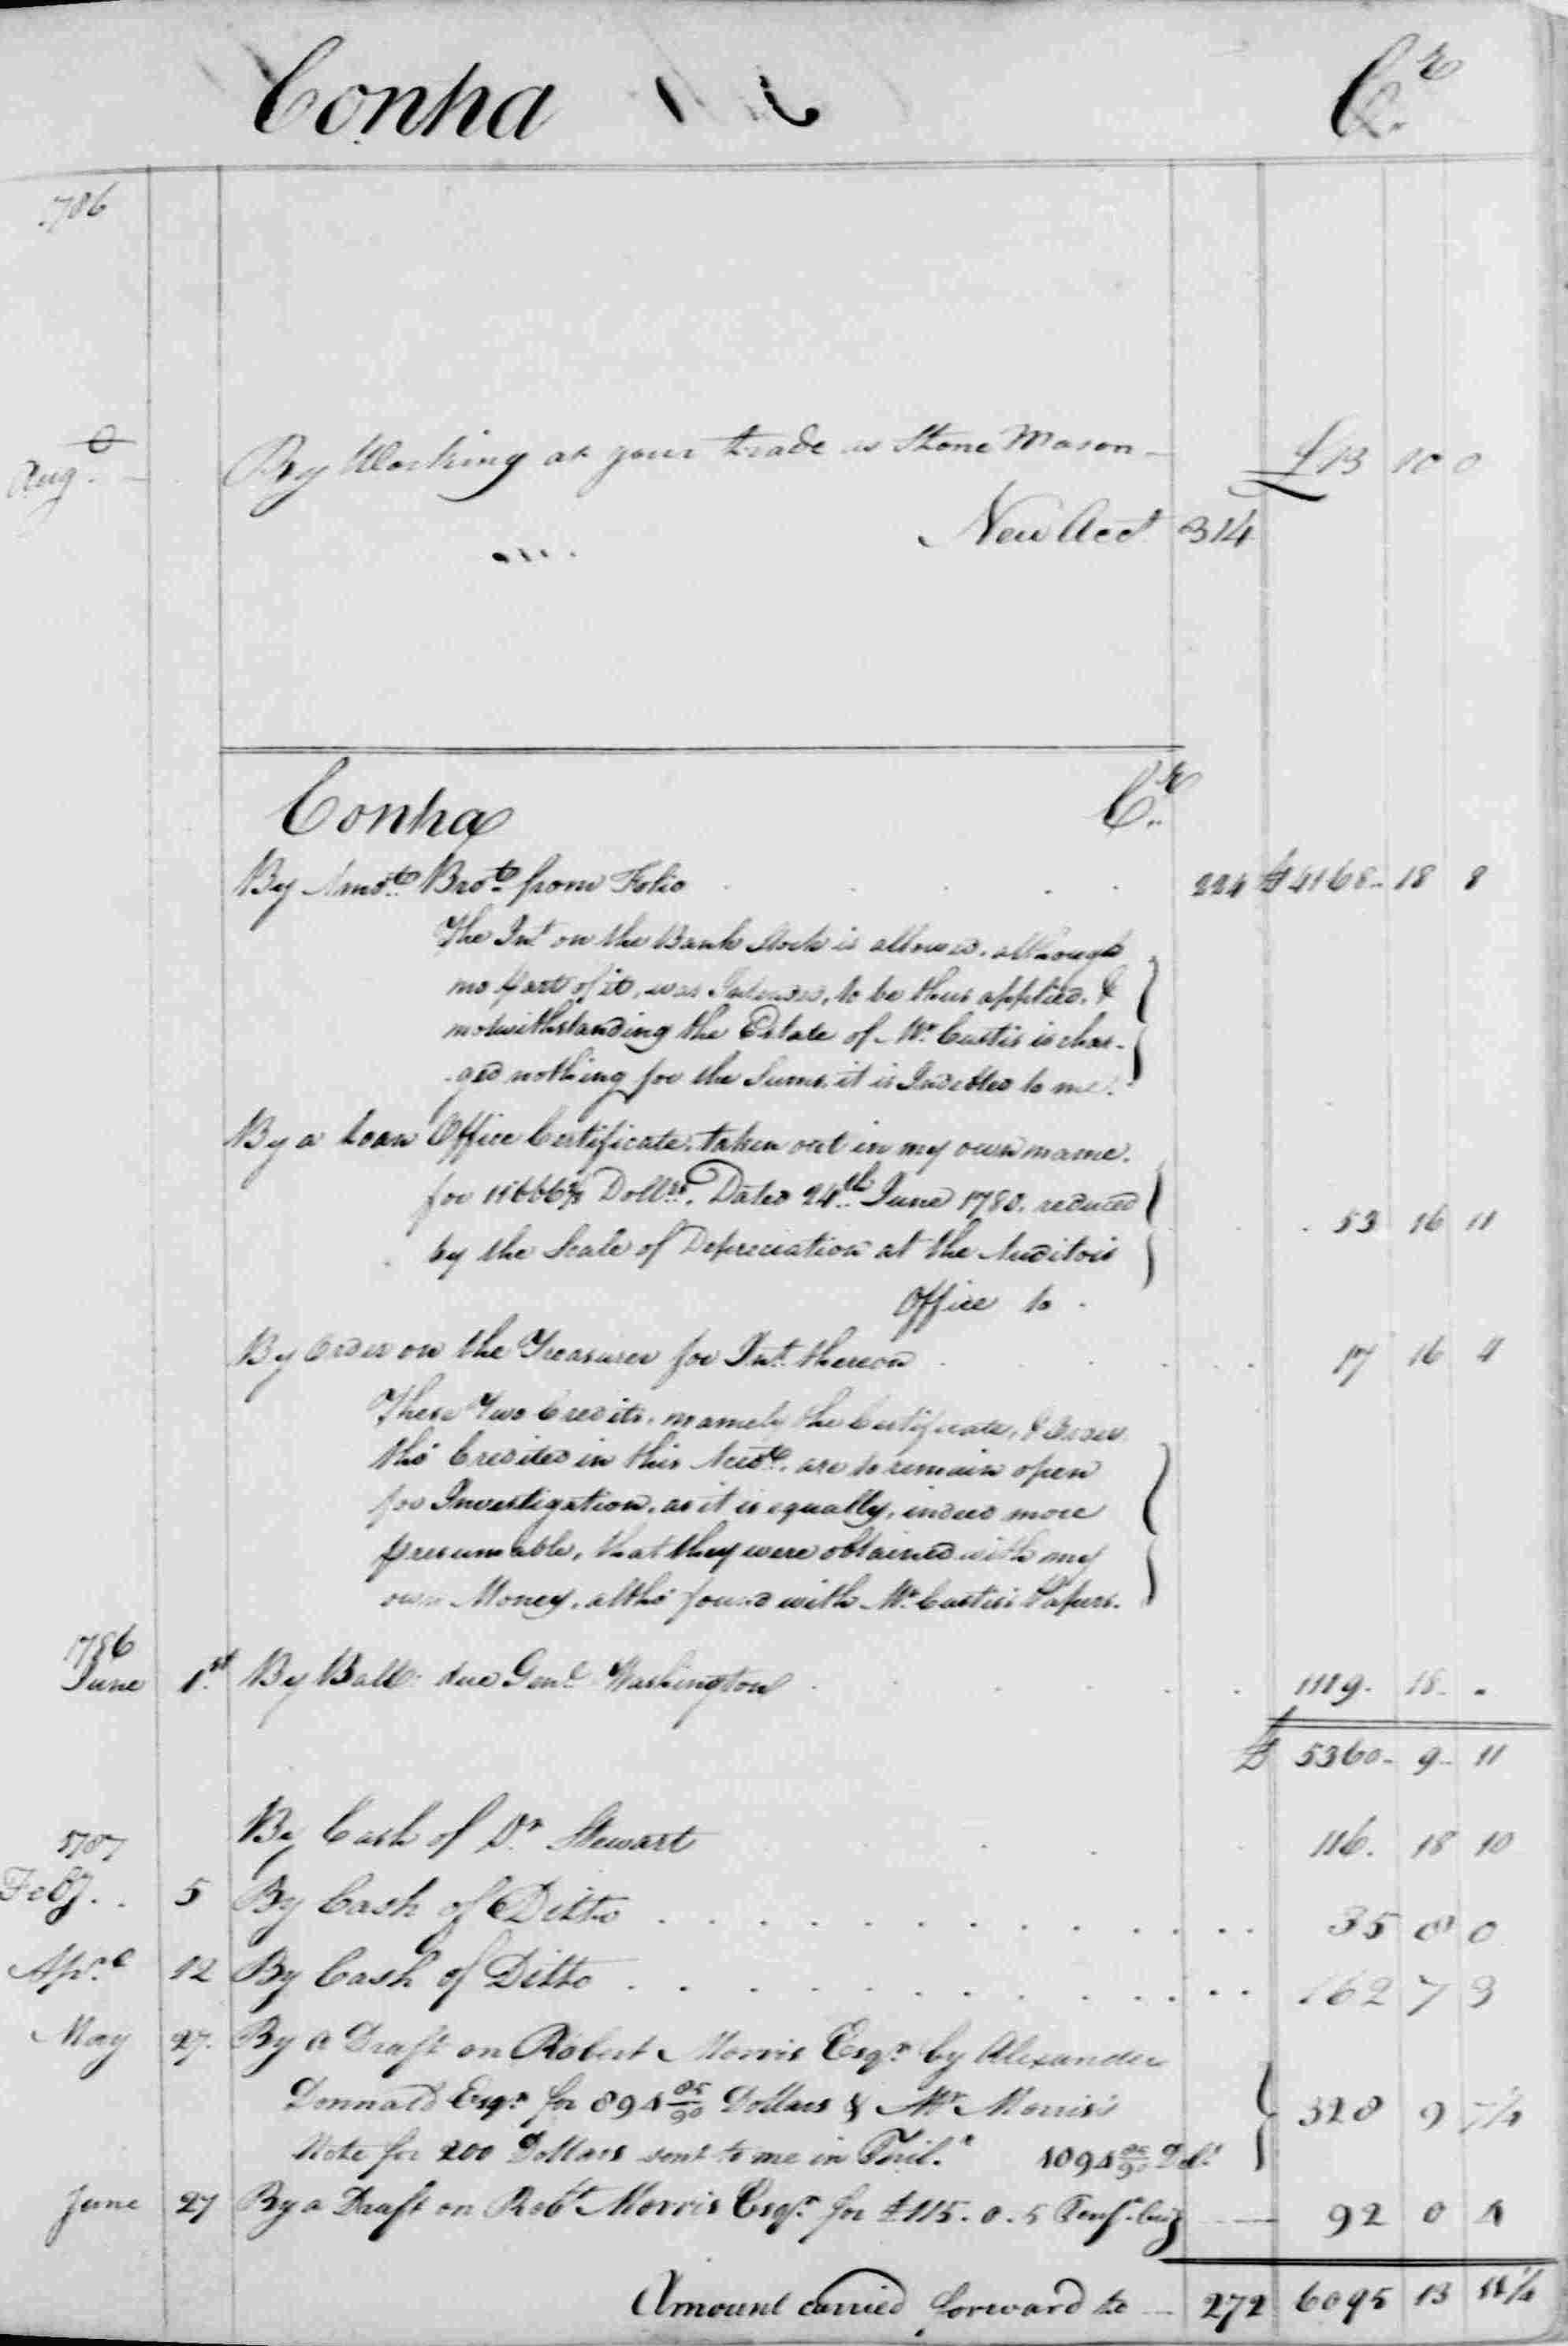 Ledger B, folio 226, right side